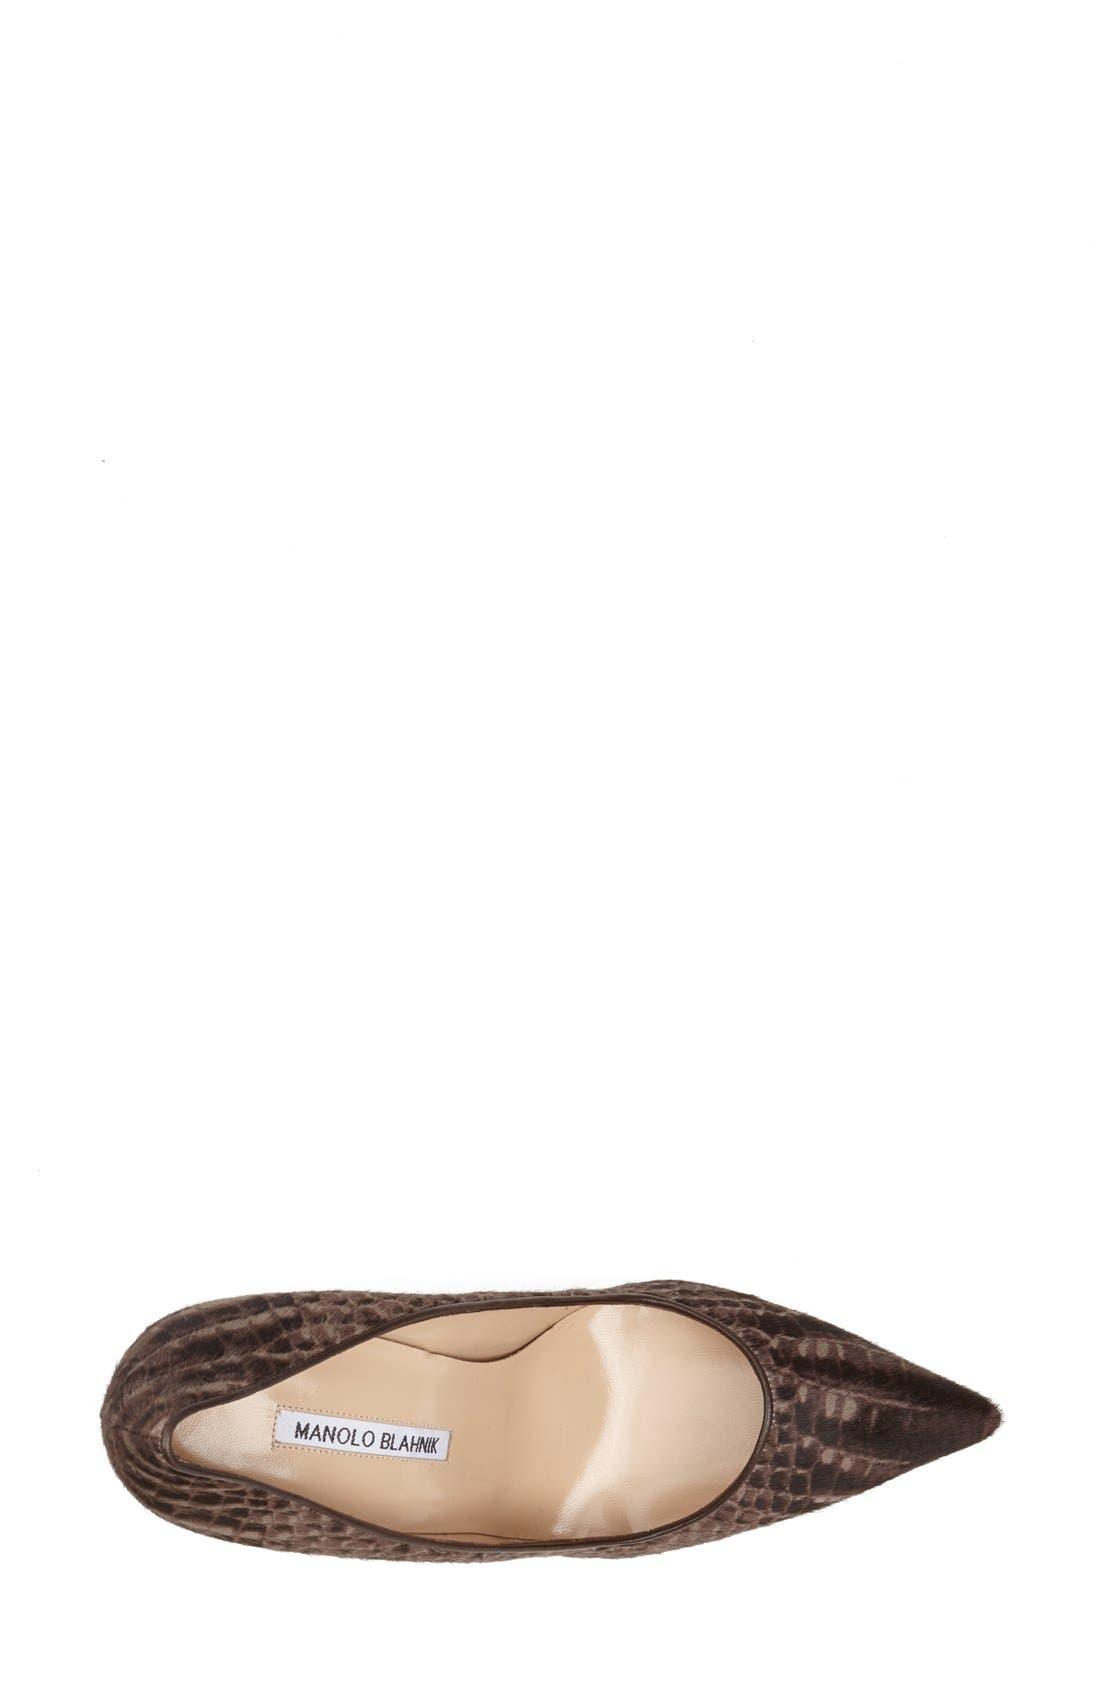 Alternate Image 3  - Manolo Blahnik 'BB' Calf Hair Pump (Women)